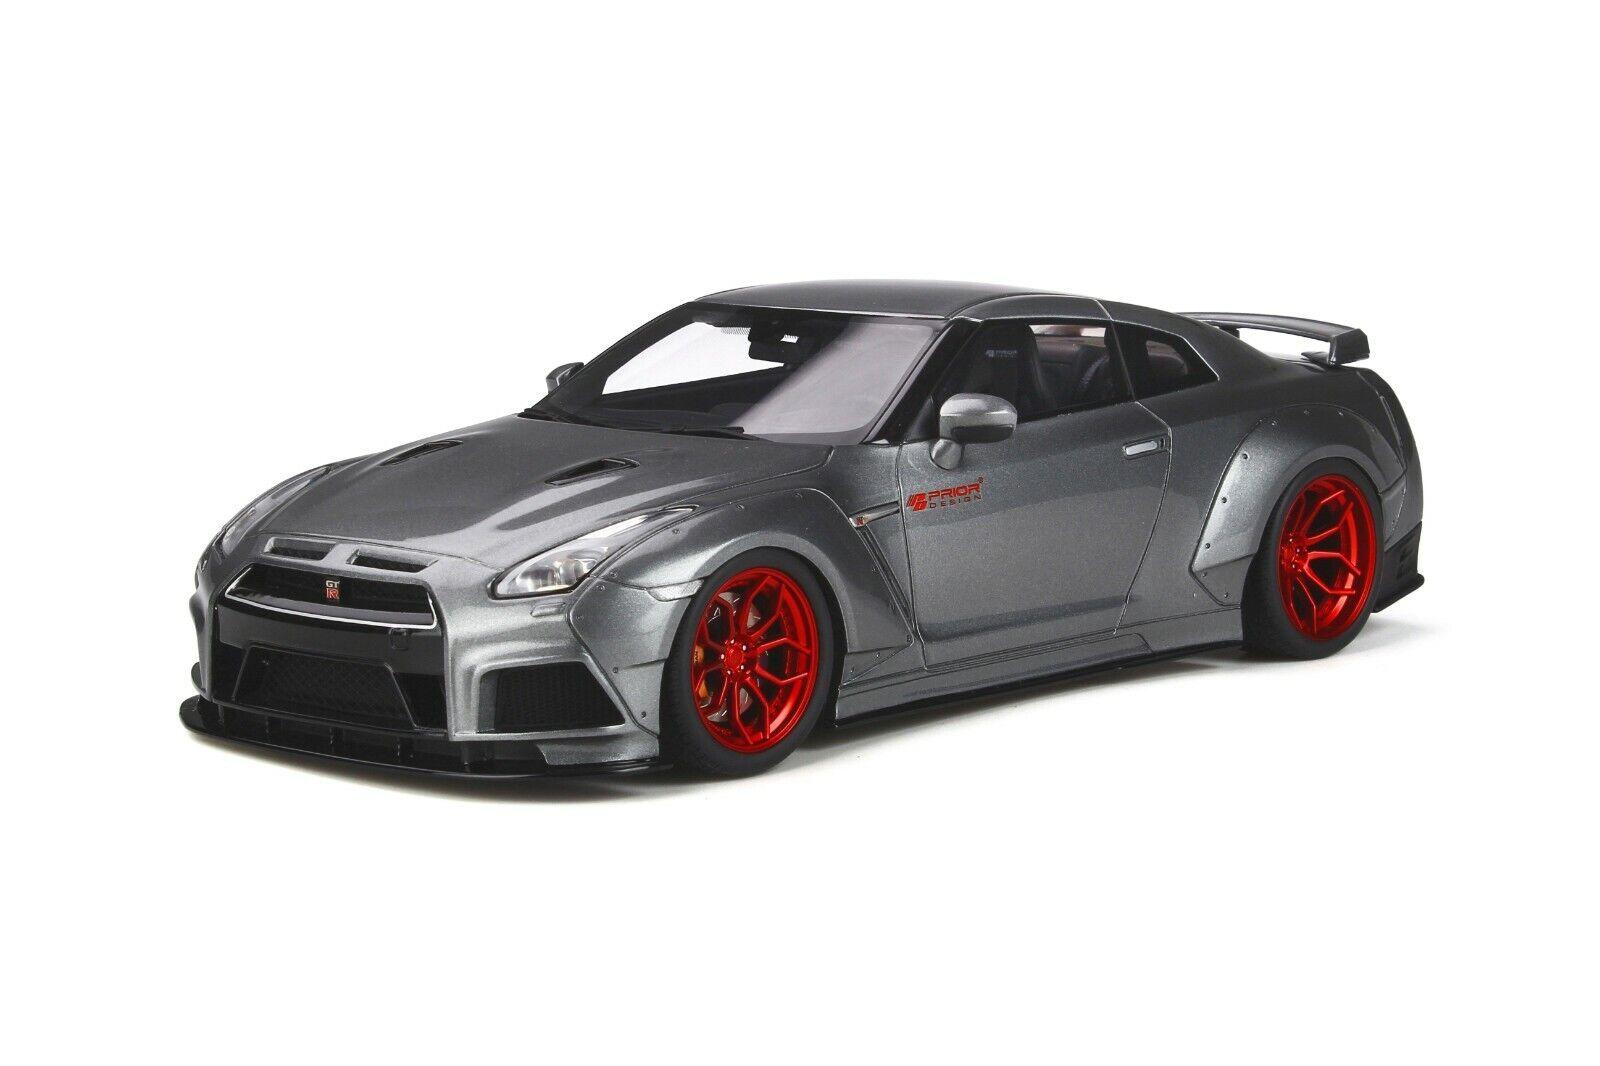 GT Spirit 1 18 Nissan Skyline GT-R R35 modificado por antes de diseño 2015 gris GT243